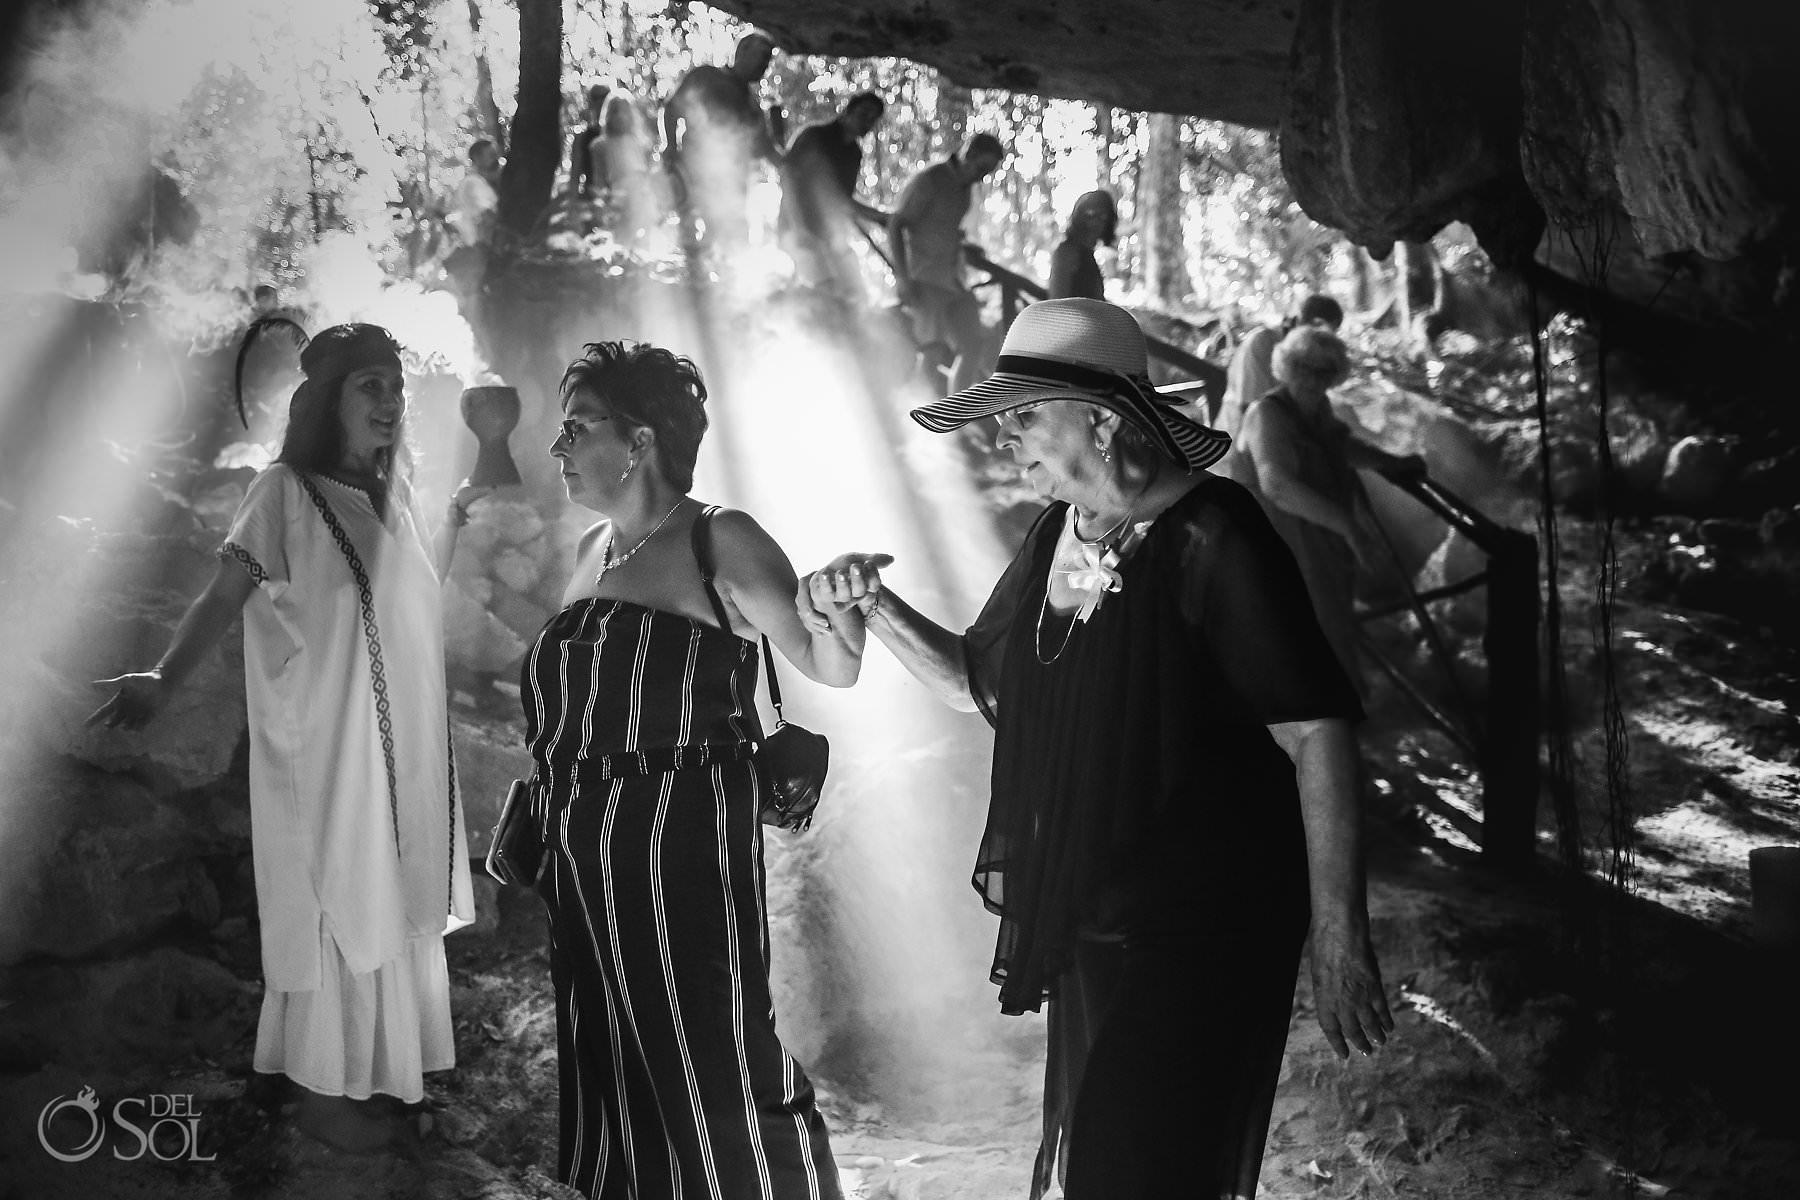 Mexico Cave Wedding Ceremony